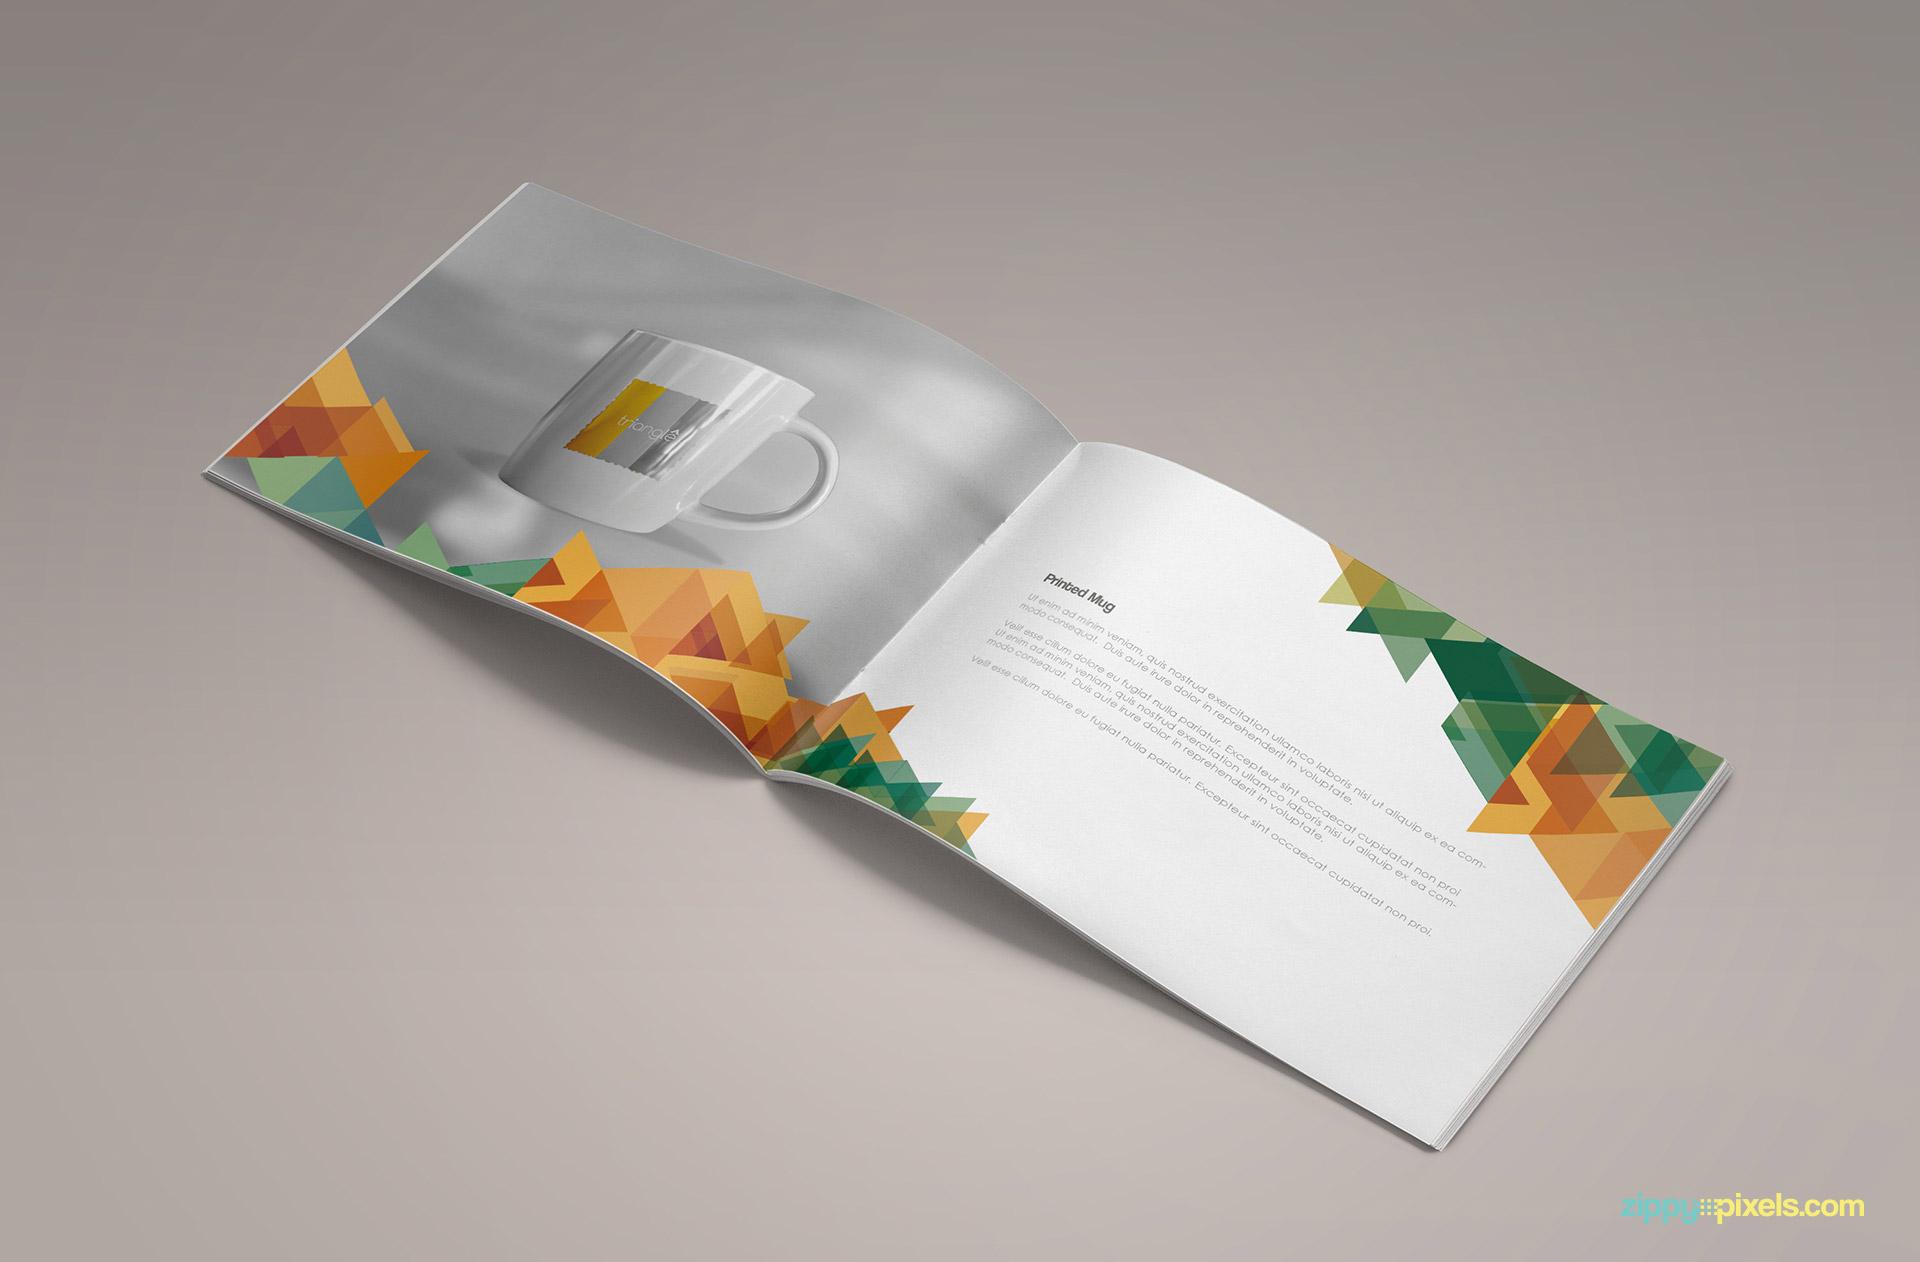 15-brand-book-9-printed-mug